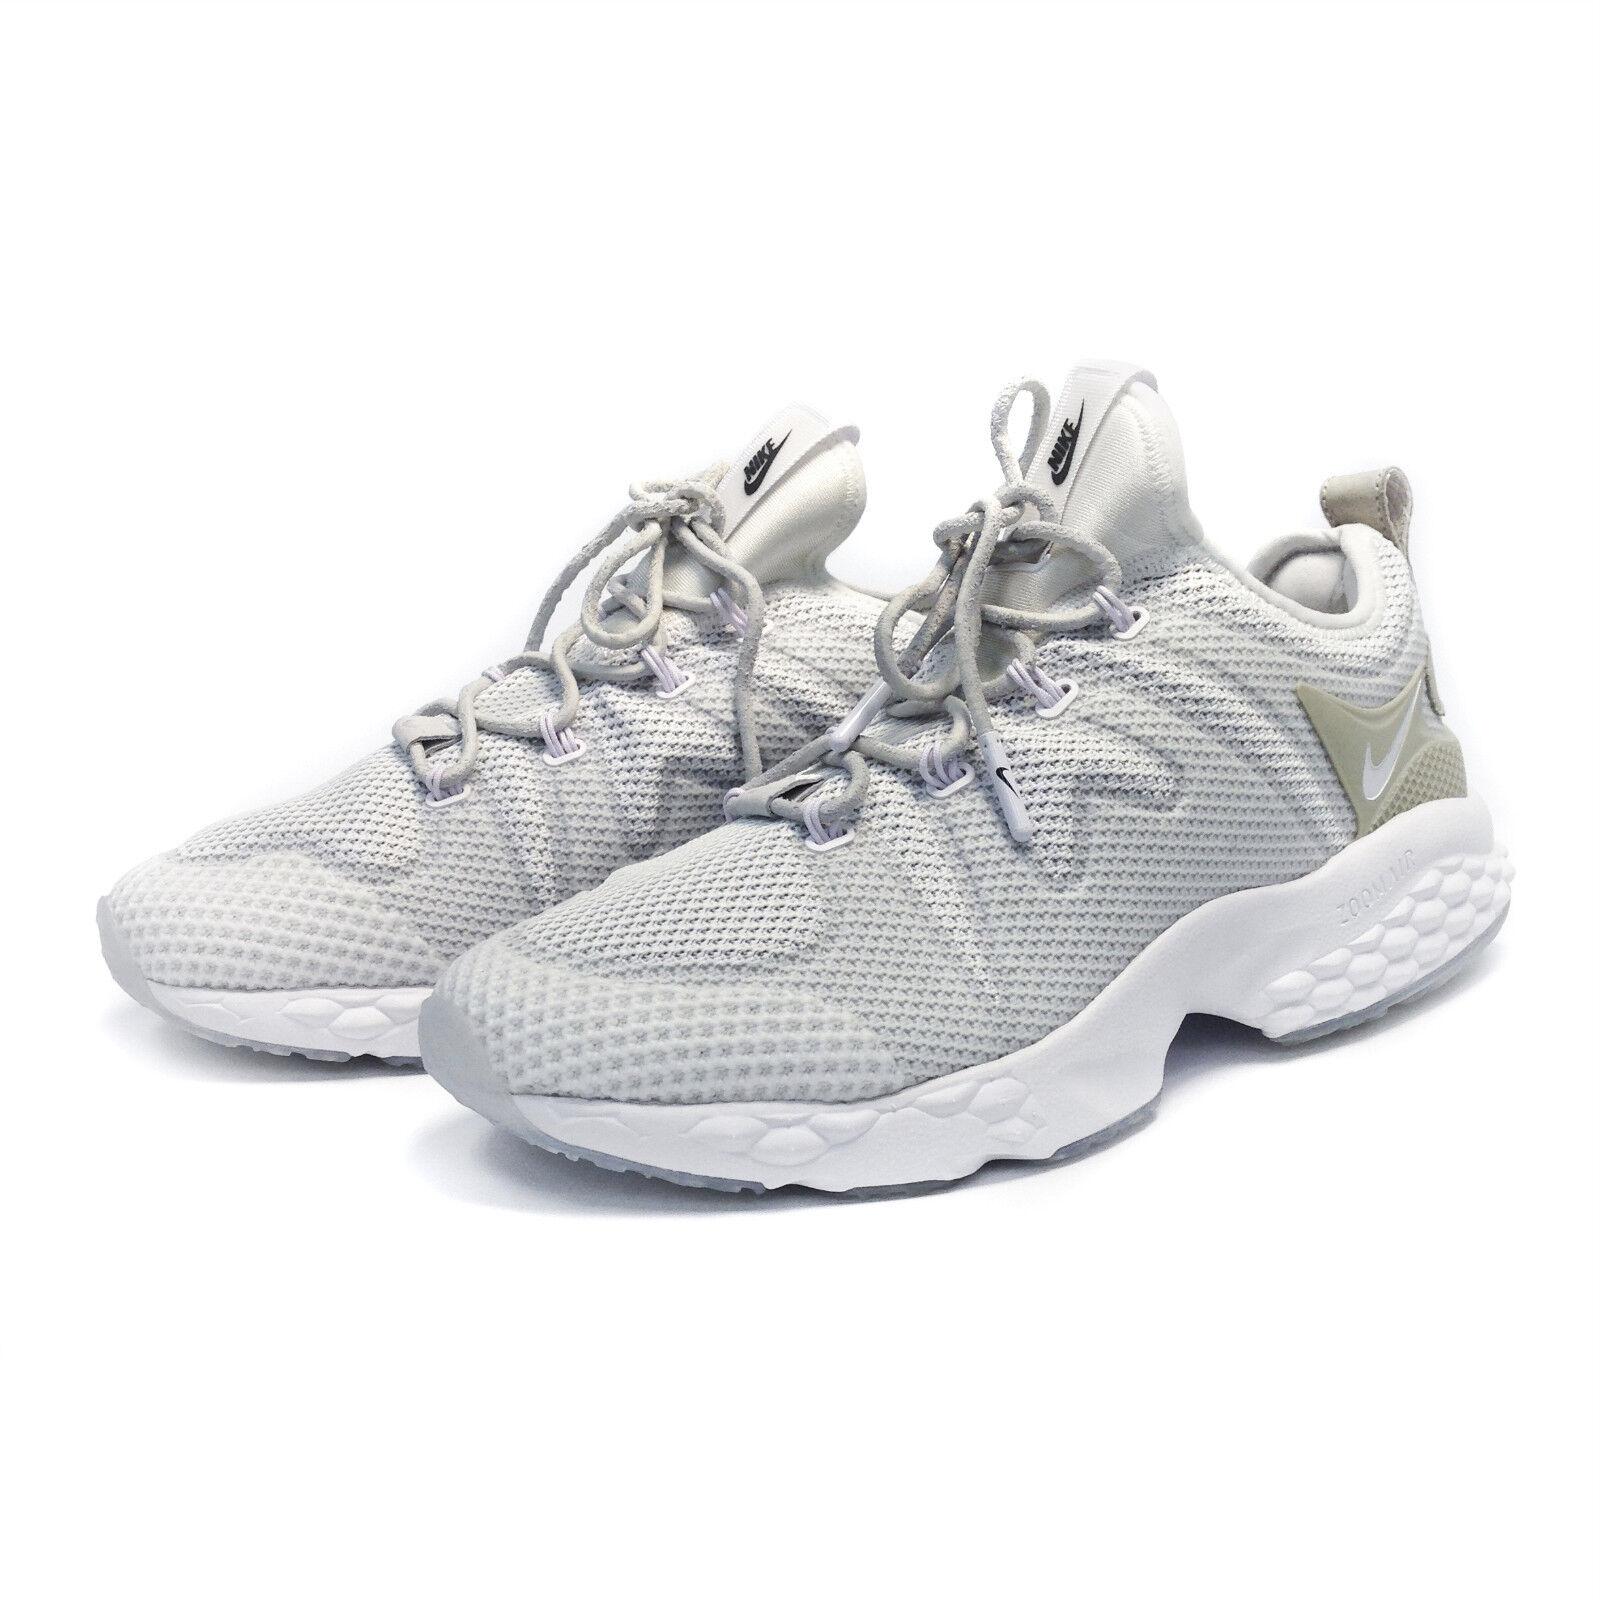 Nike Lab Air Zoom LWP x Kim Jones femmes Chaussures